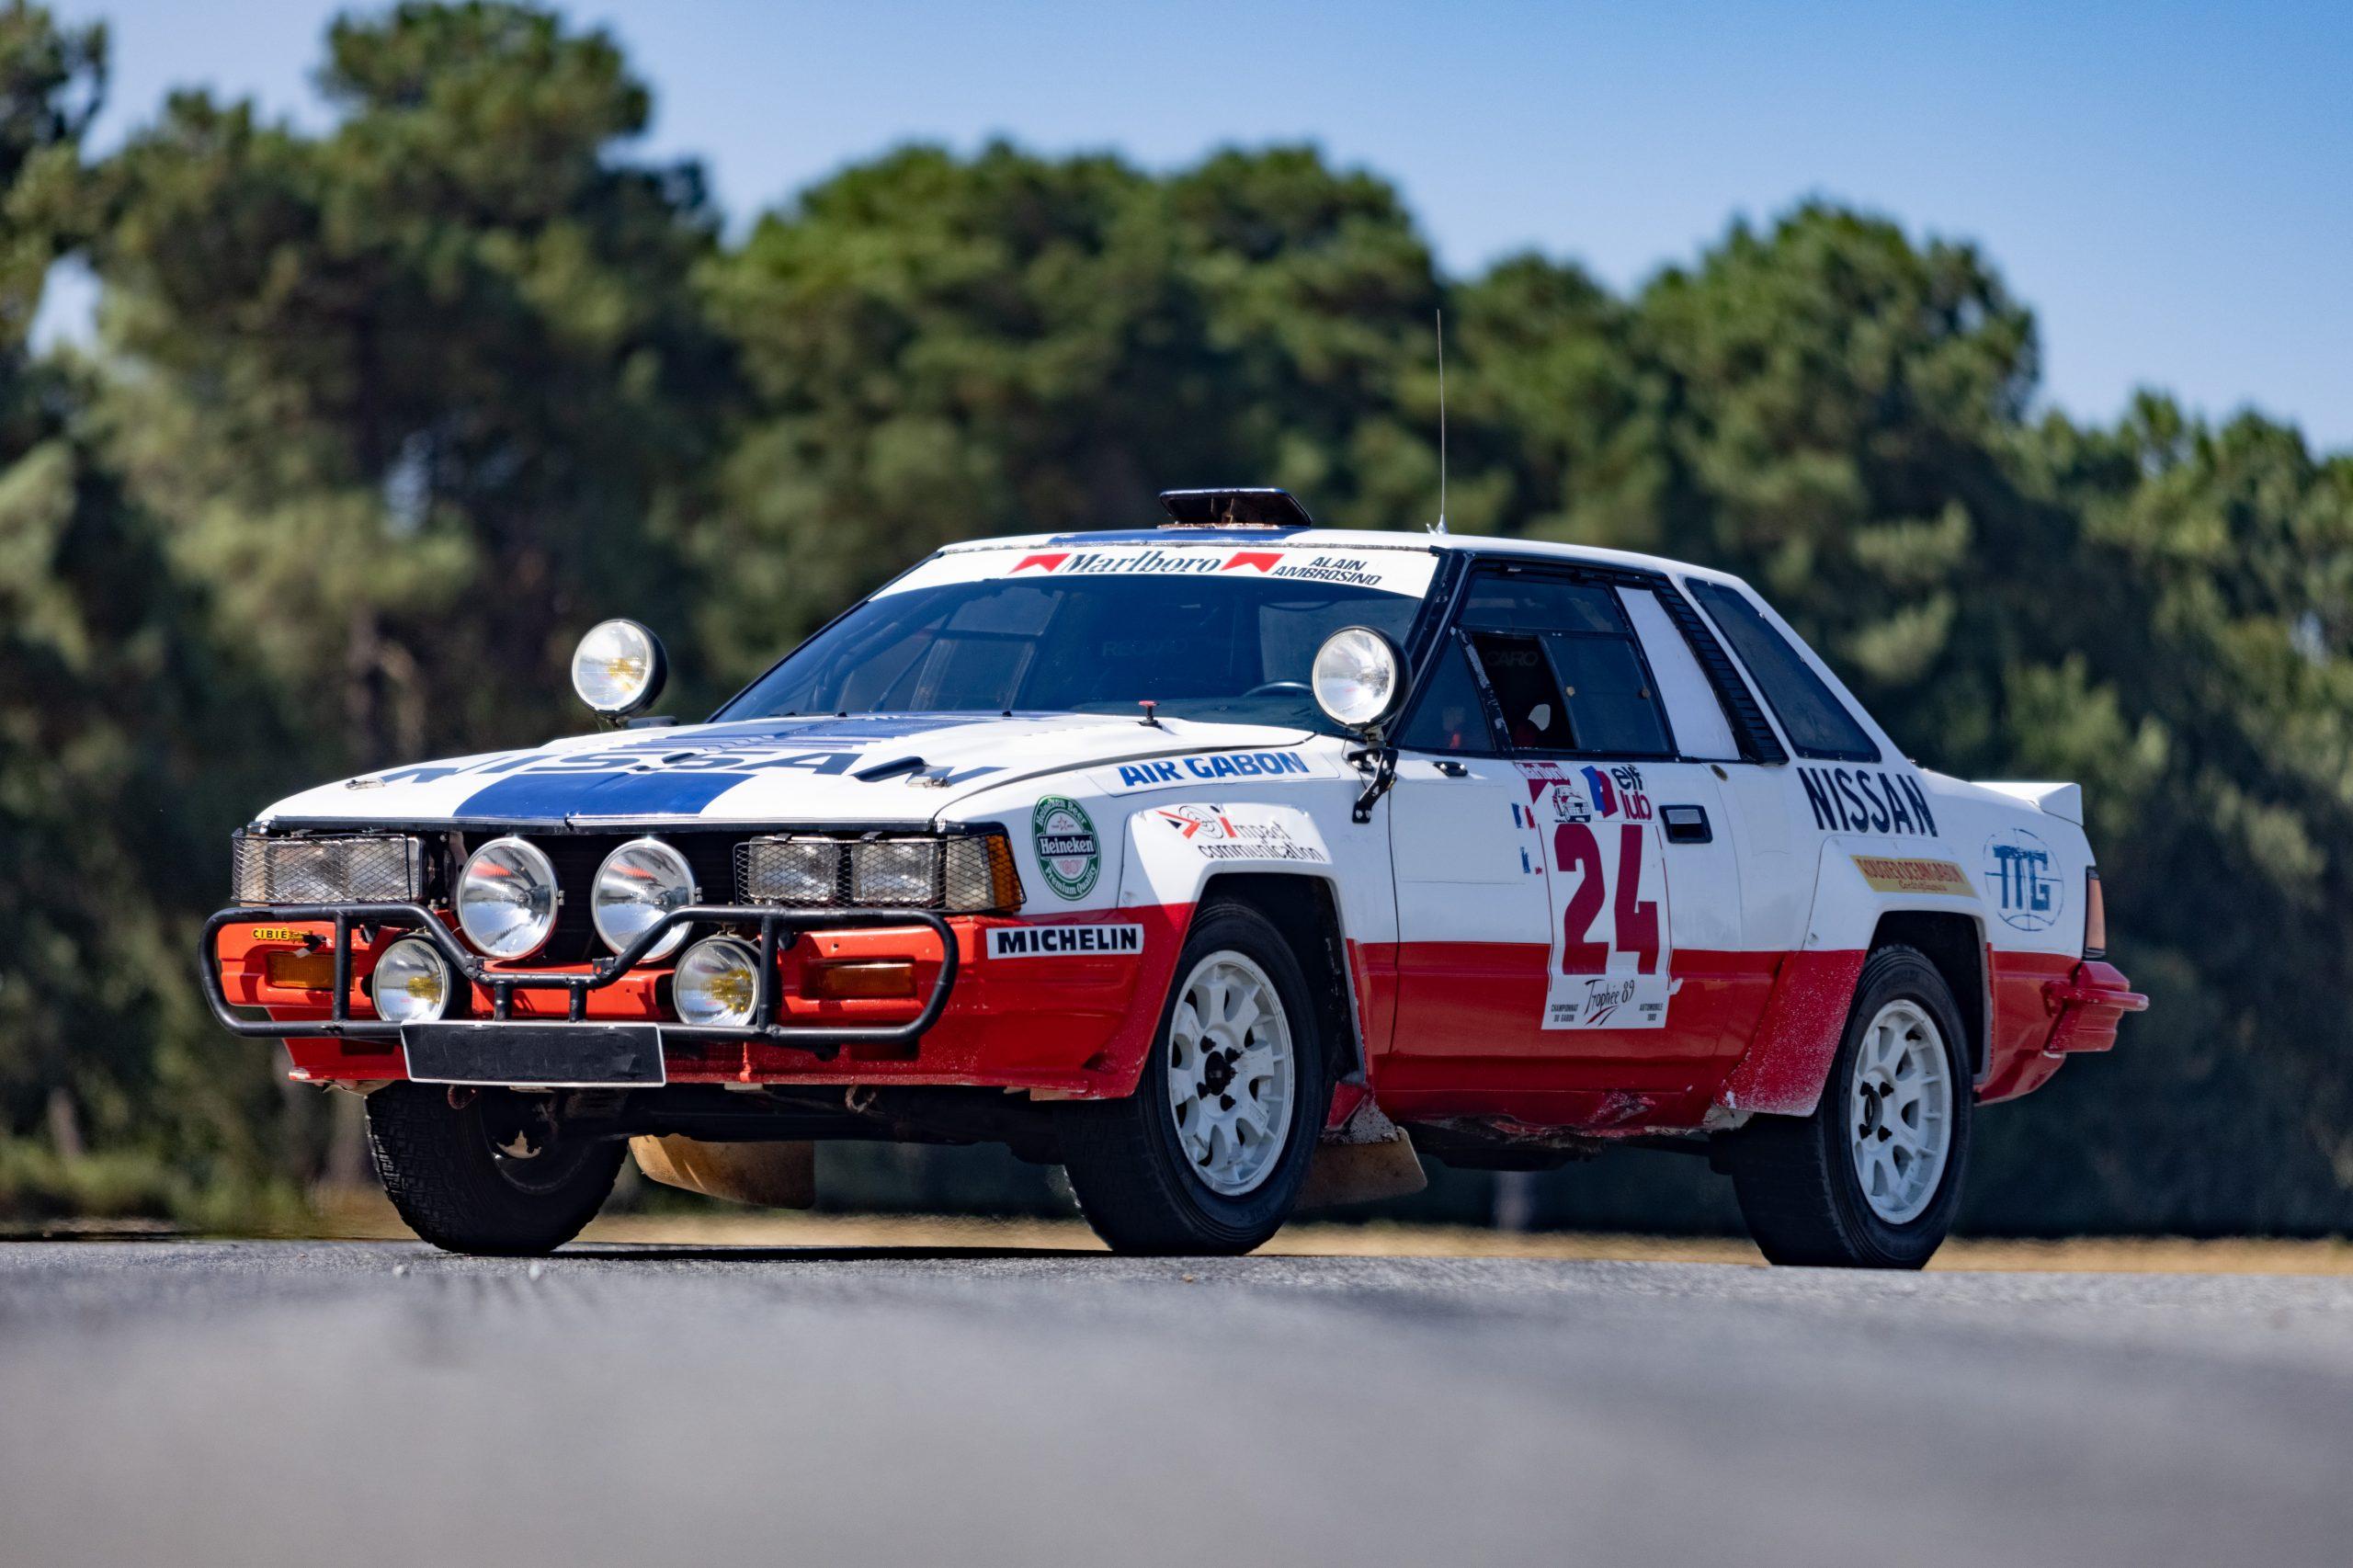 1986 Nissan 240RS © Romaric Croisile